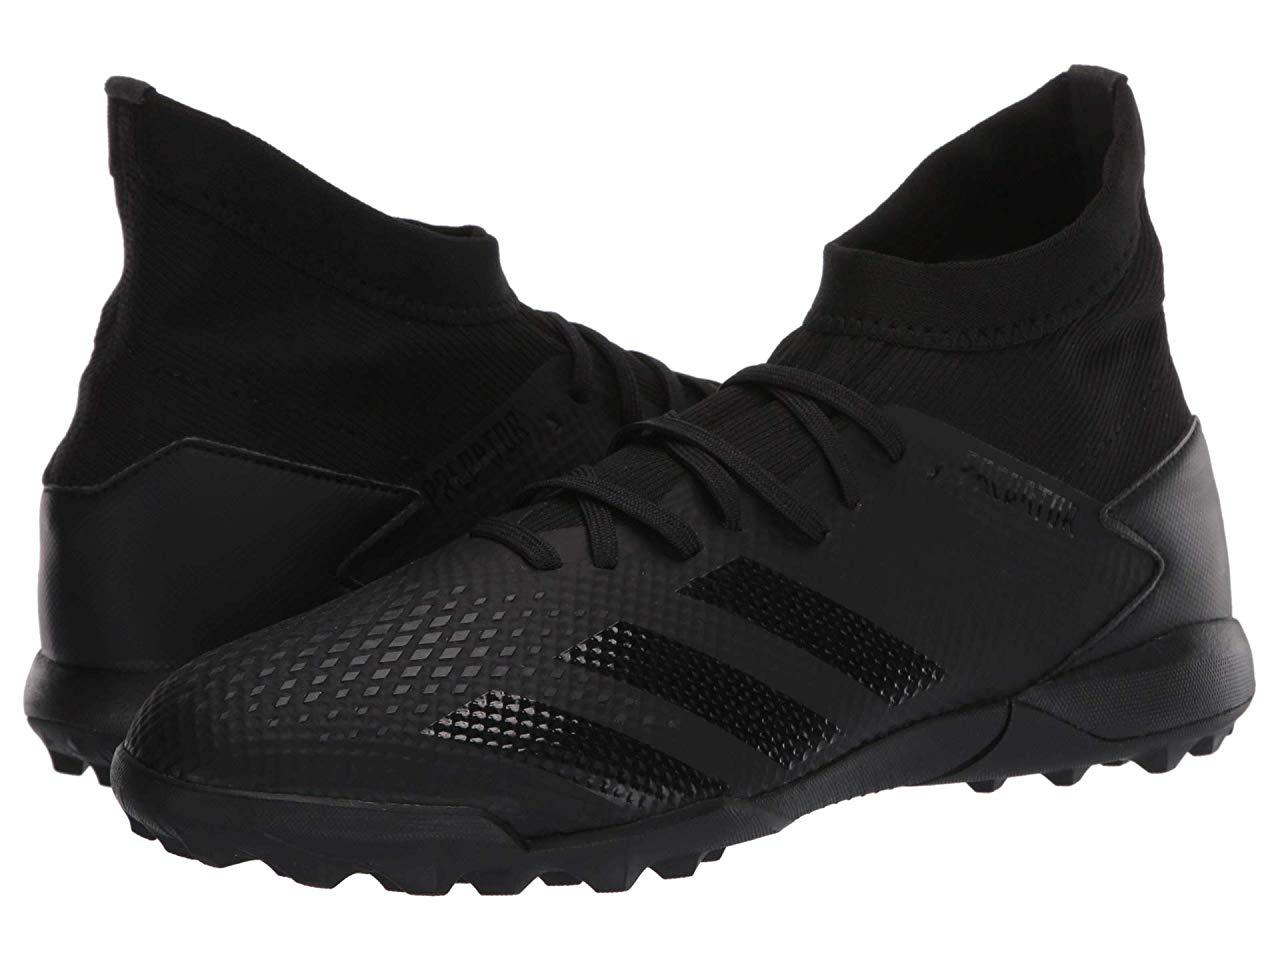 Кроссовки/Кеды (Оригинал) adidas Predator 20.3 Tf Core Black/Core Black/Dark Grey Heather Solid Grey